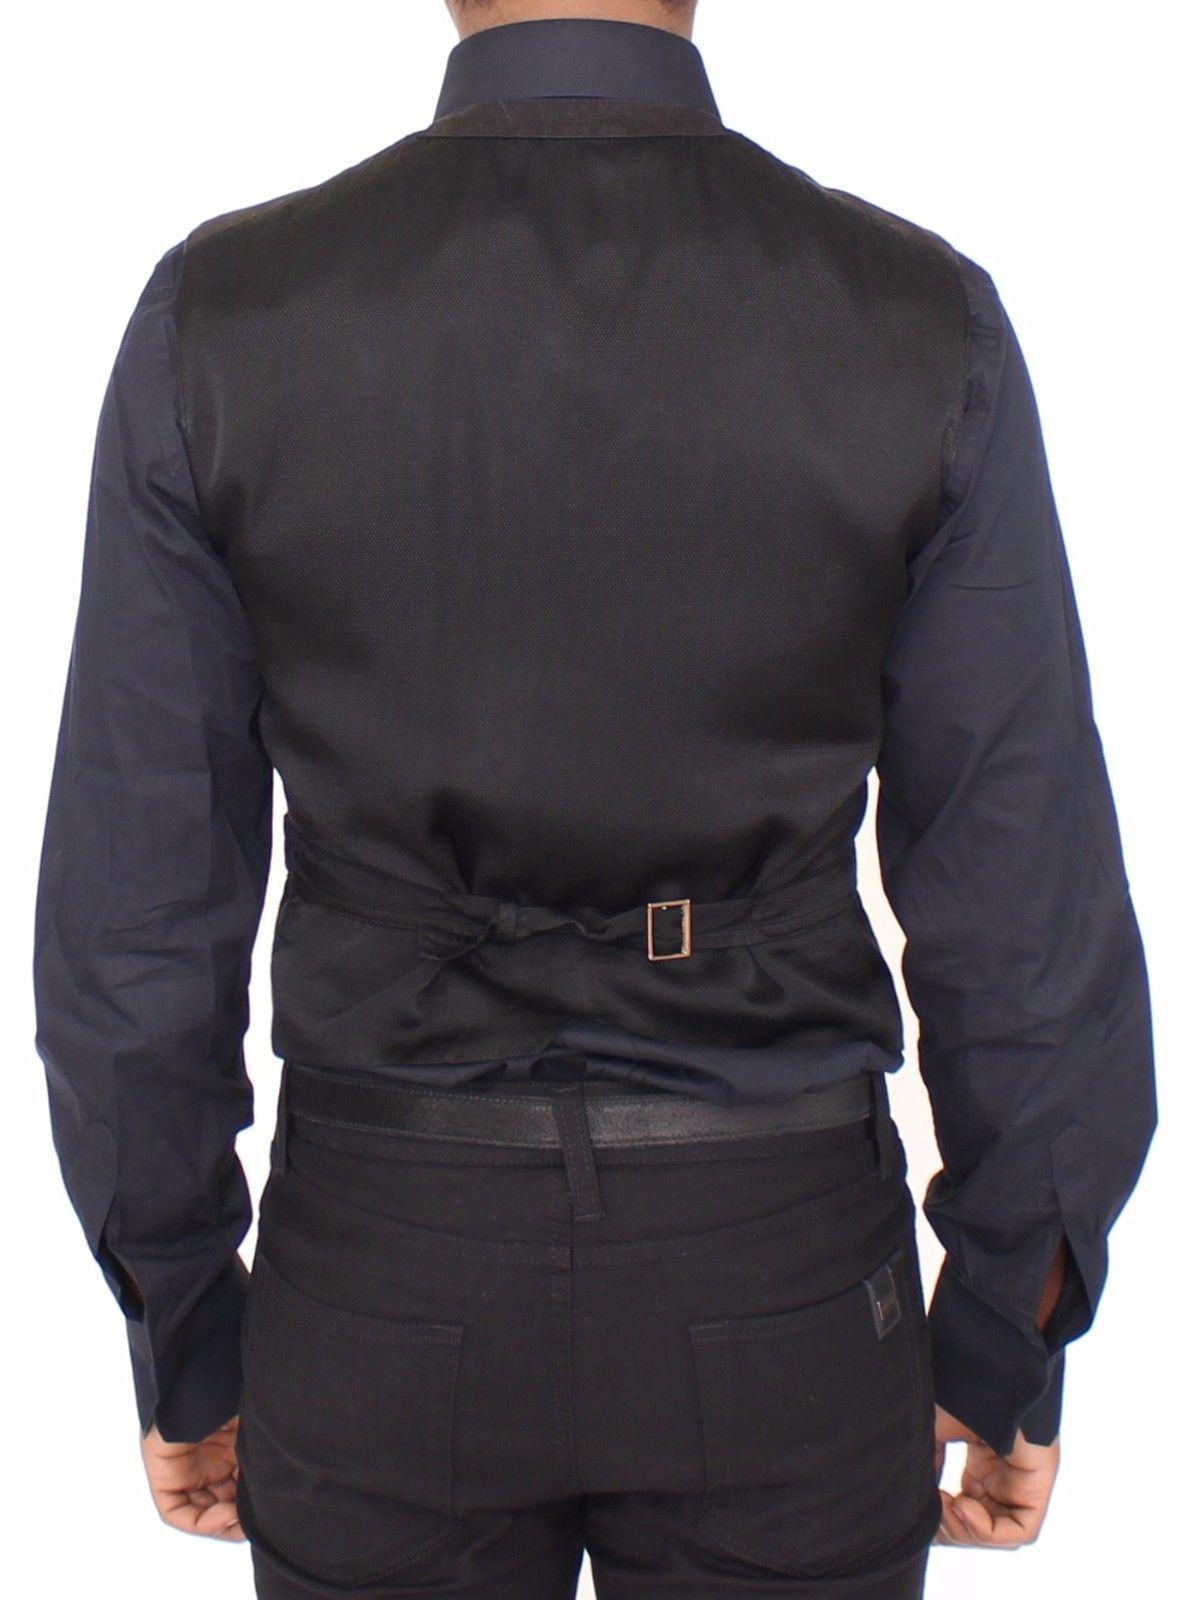 Dolce & Gabbana Black Flax Cotton Dress Vest Blazer